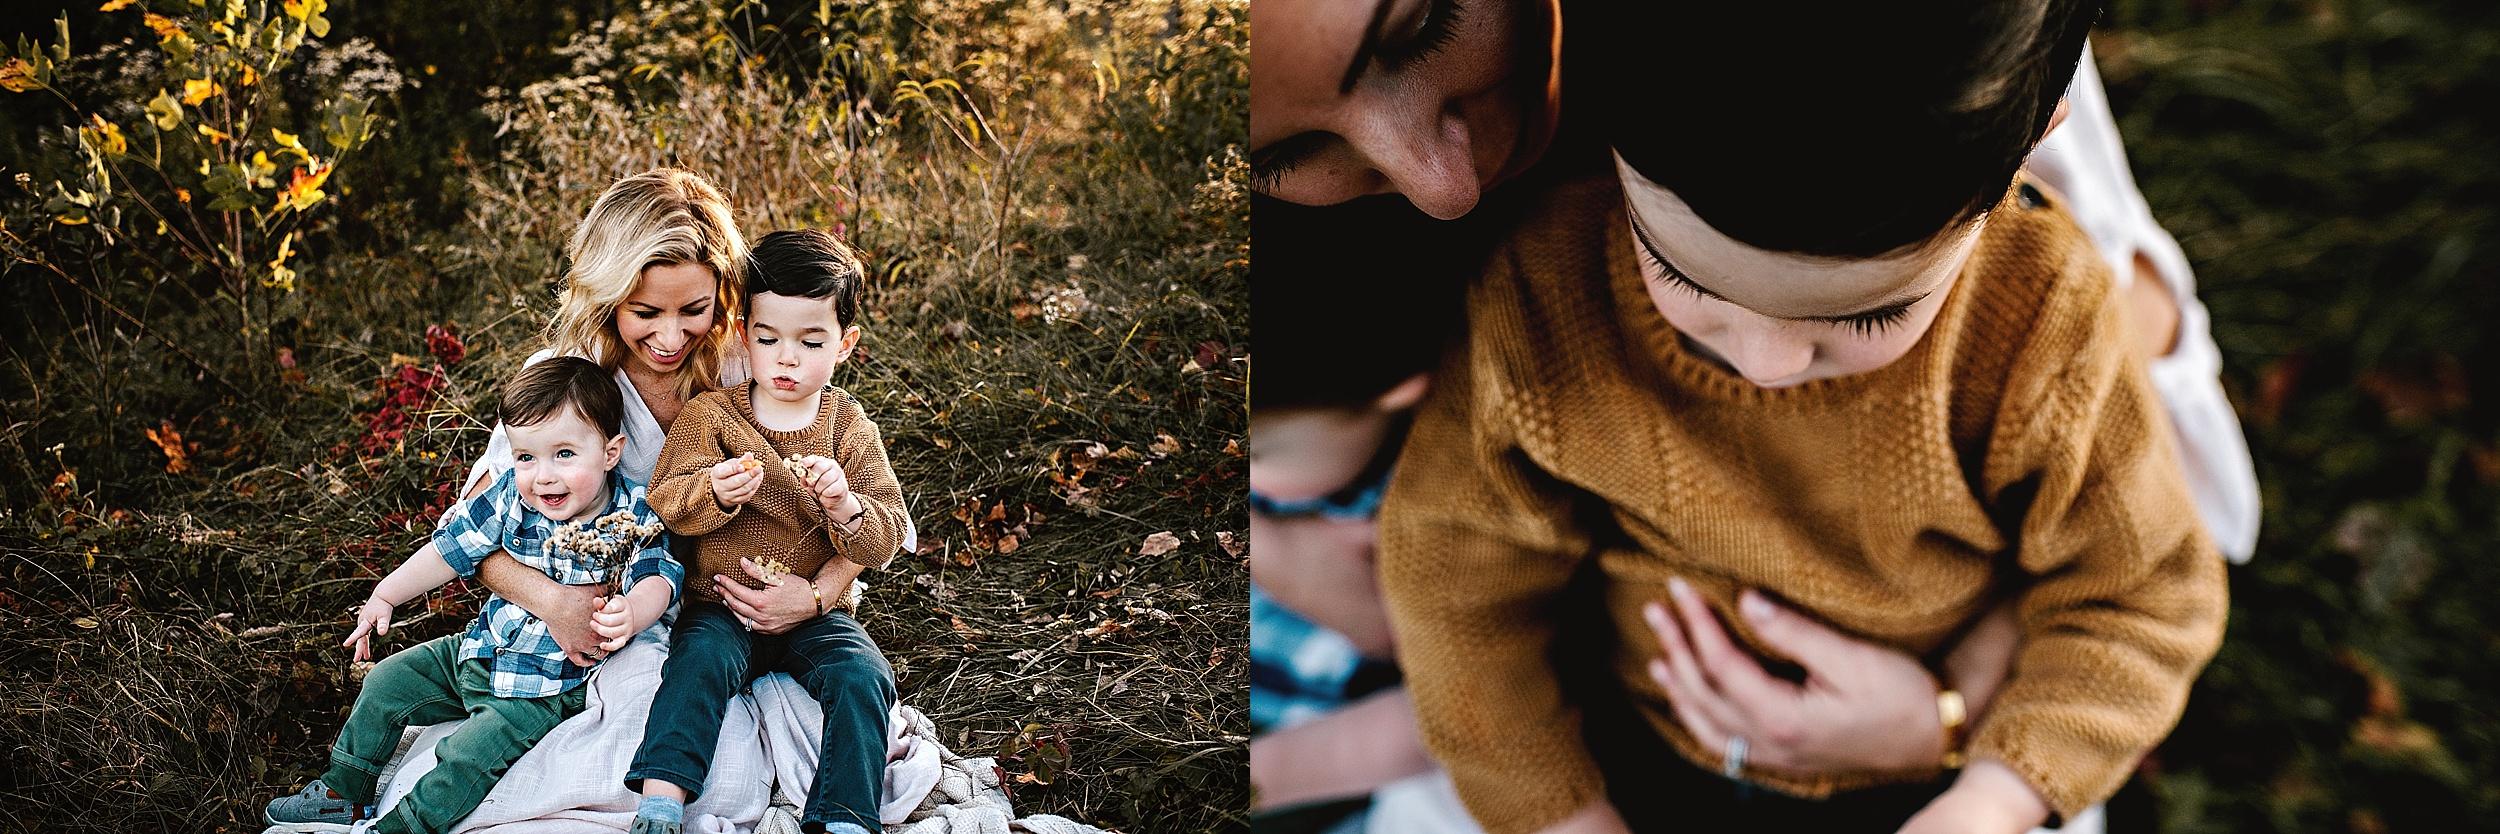 lauren-grayson-photography-portrait-artist-akron-cleveland-ohio-photographer-family-session-fields-sunset-fall_0178.jpg